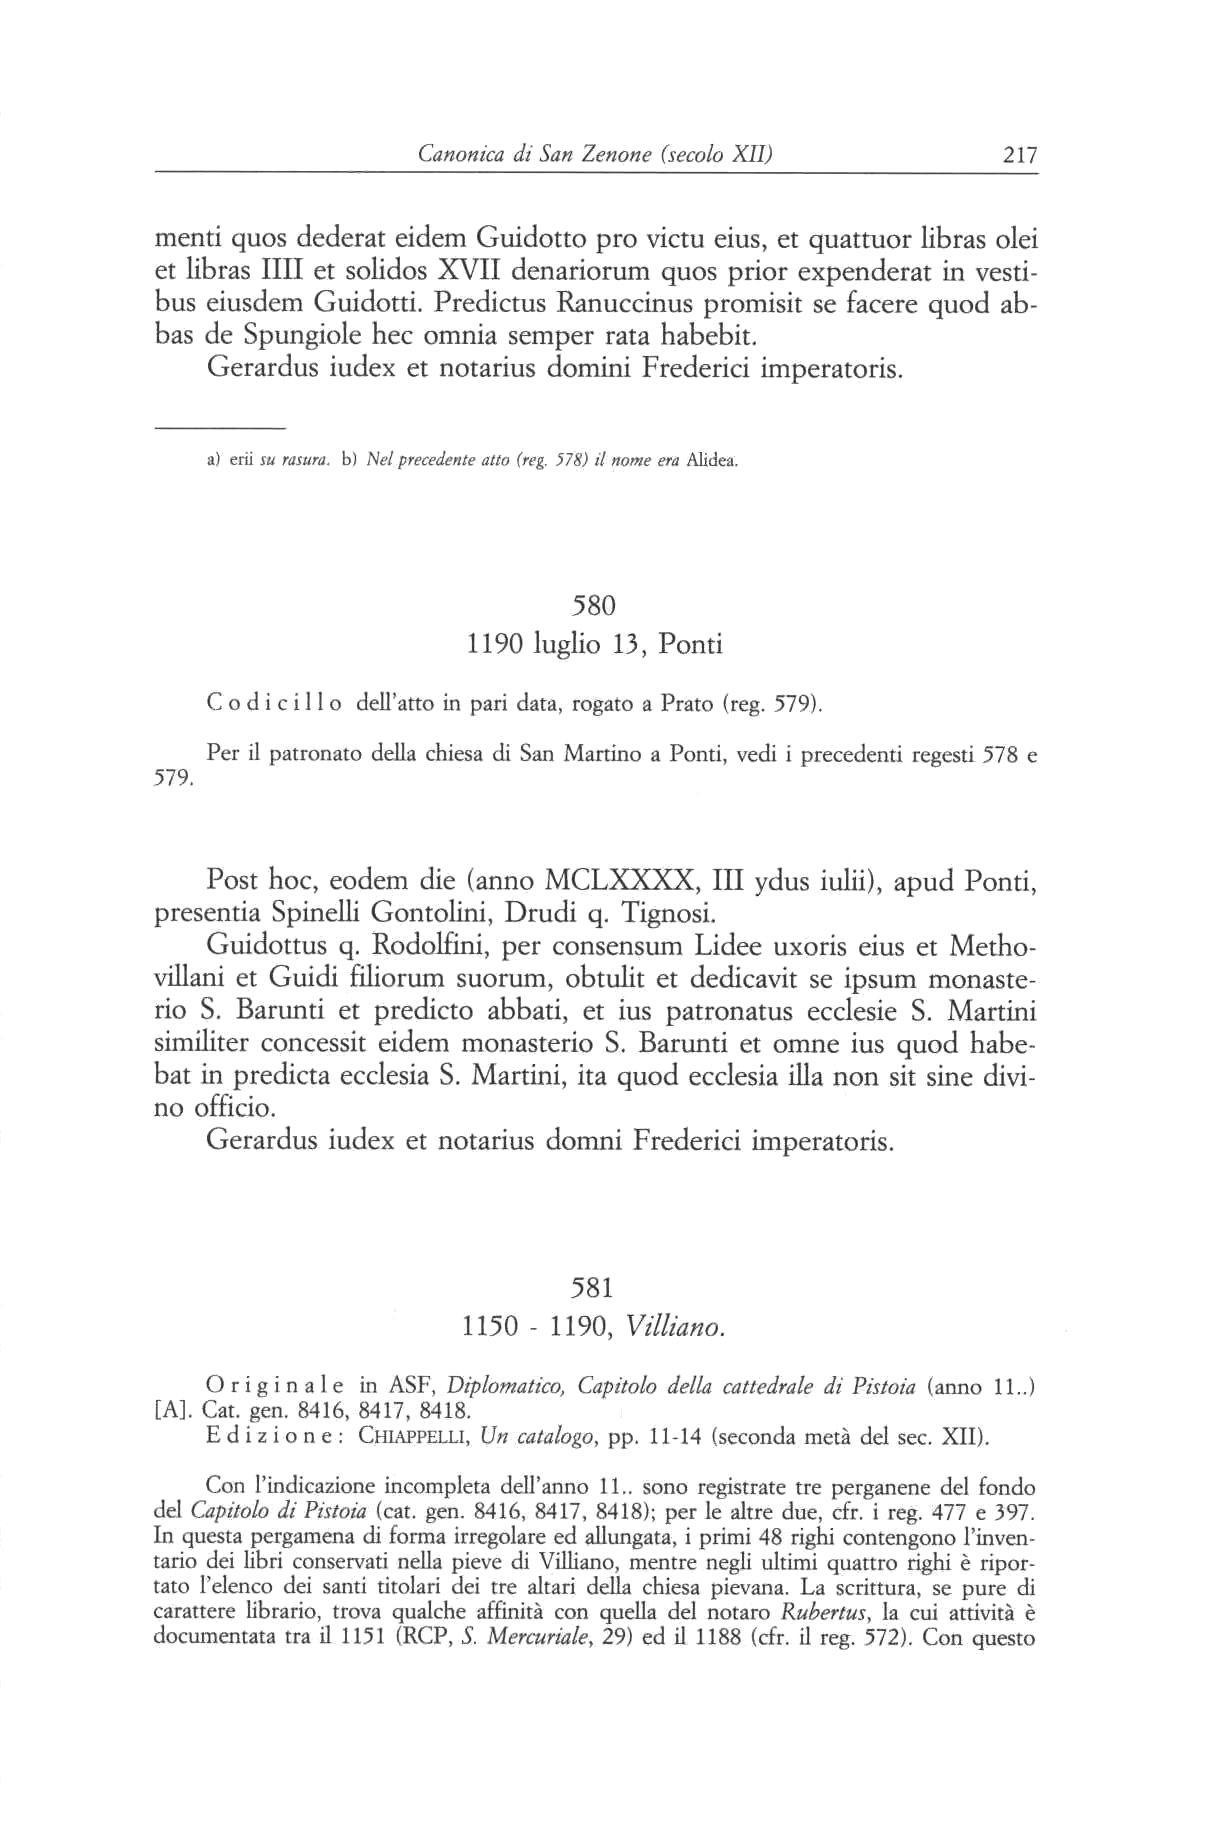 Canonica S. Zenone XII 0217.jpg